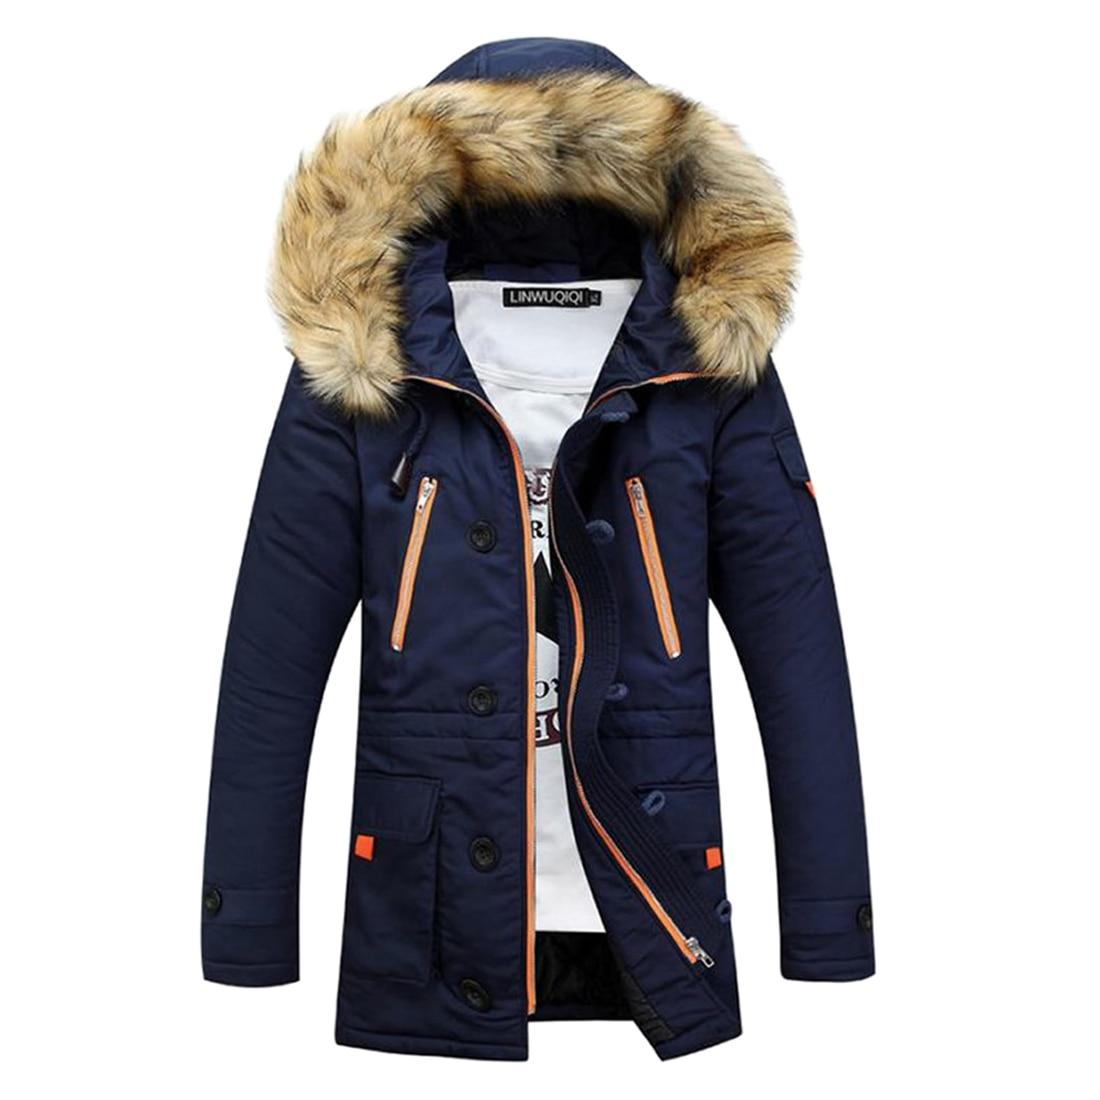 Parka   Men Coats Winter Jacket Men Plus Size Thicken Fur Hooded Outwear Warm Coat Top Blue Casual Mens Coat Veste Homme Tops 3xl